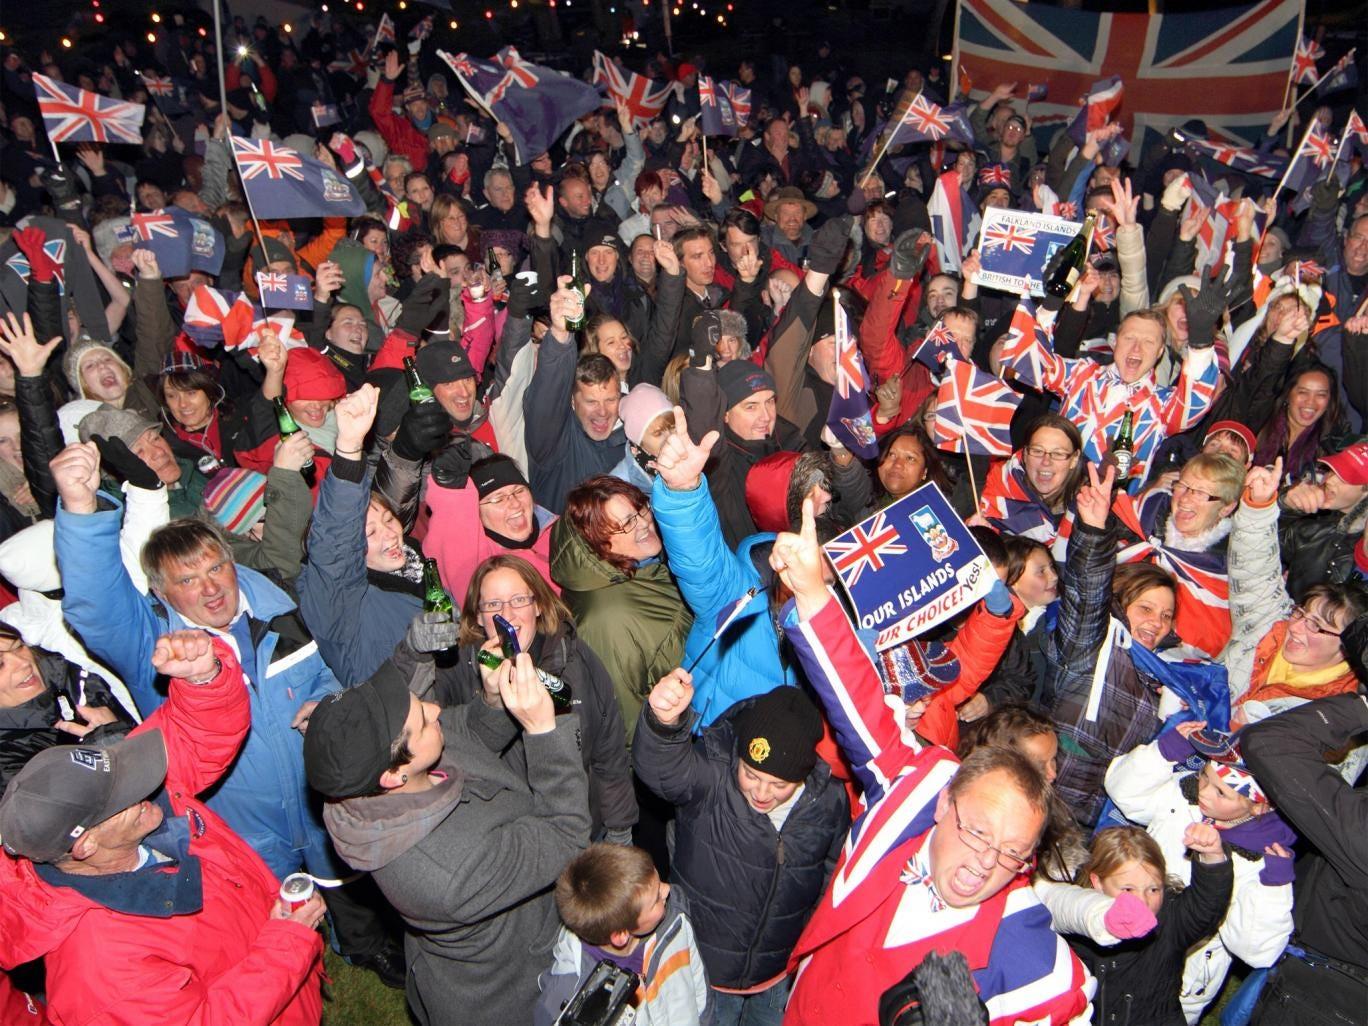 Falklanders celebrate the referendum result in Port Stanley on Monday night